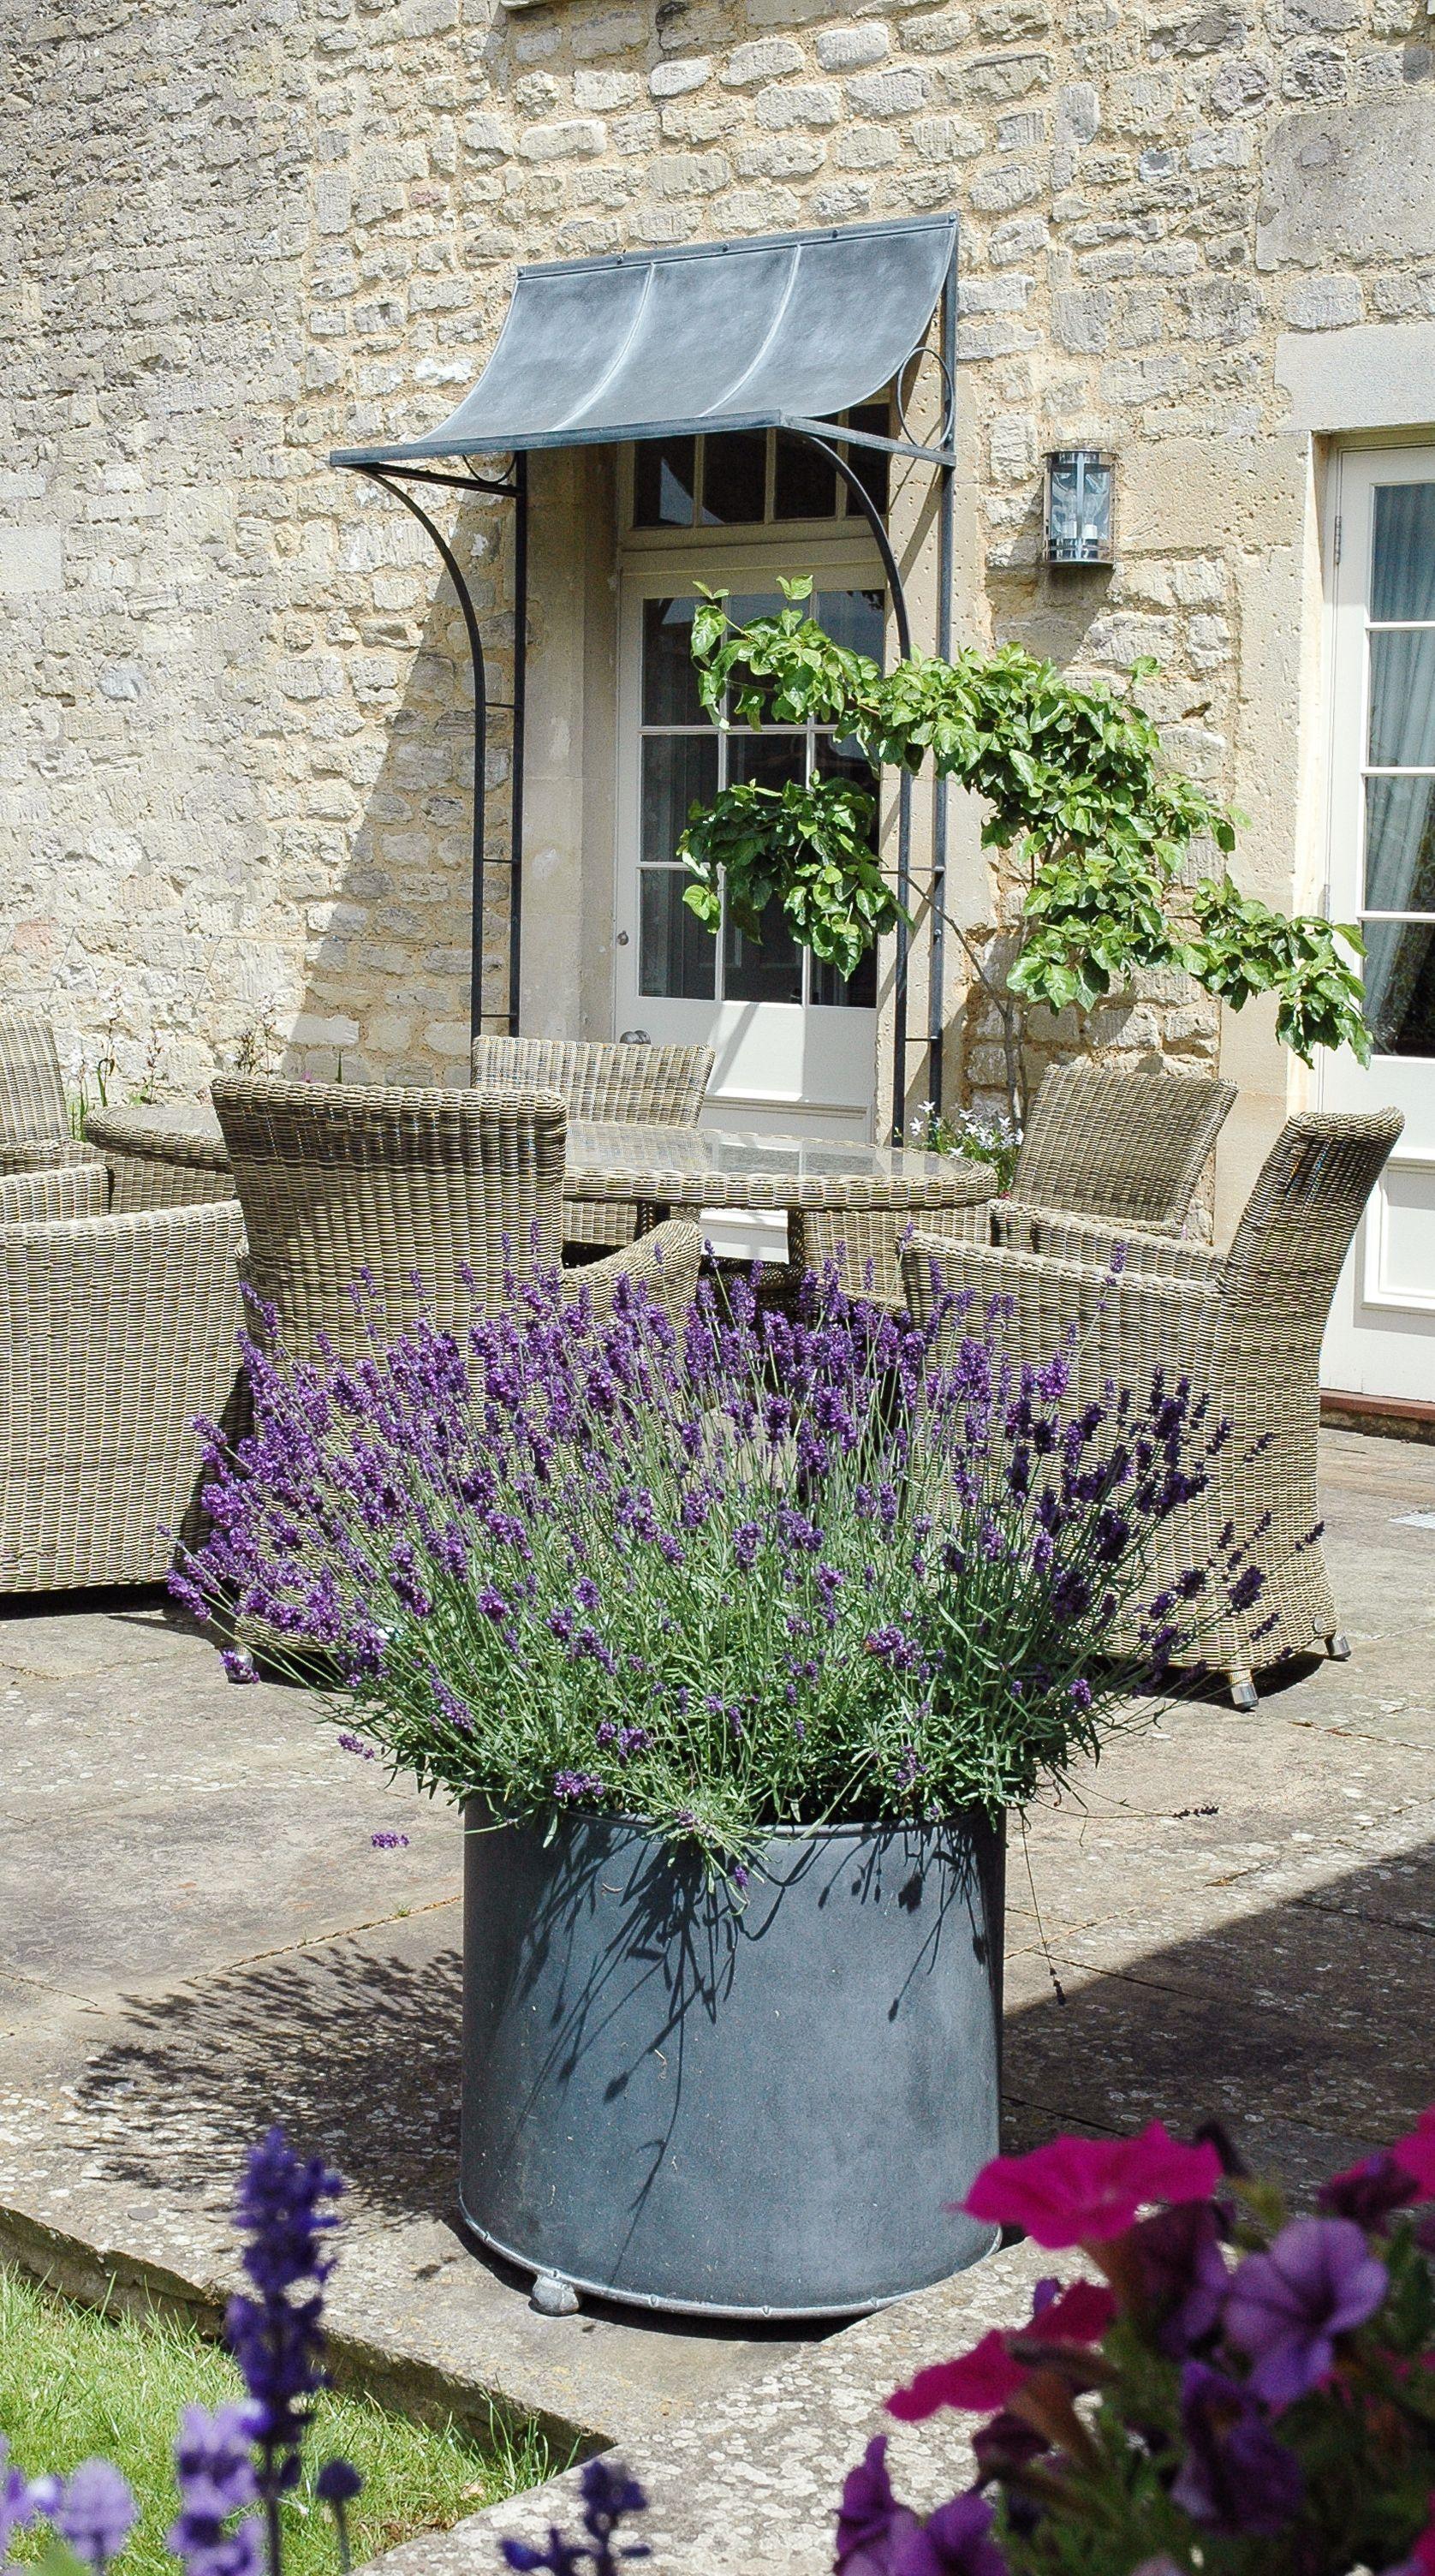 Captivating Large Garden Planters For Patios   Circular Metal Planter Pots From Garden  Requisites. #gardenplanters